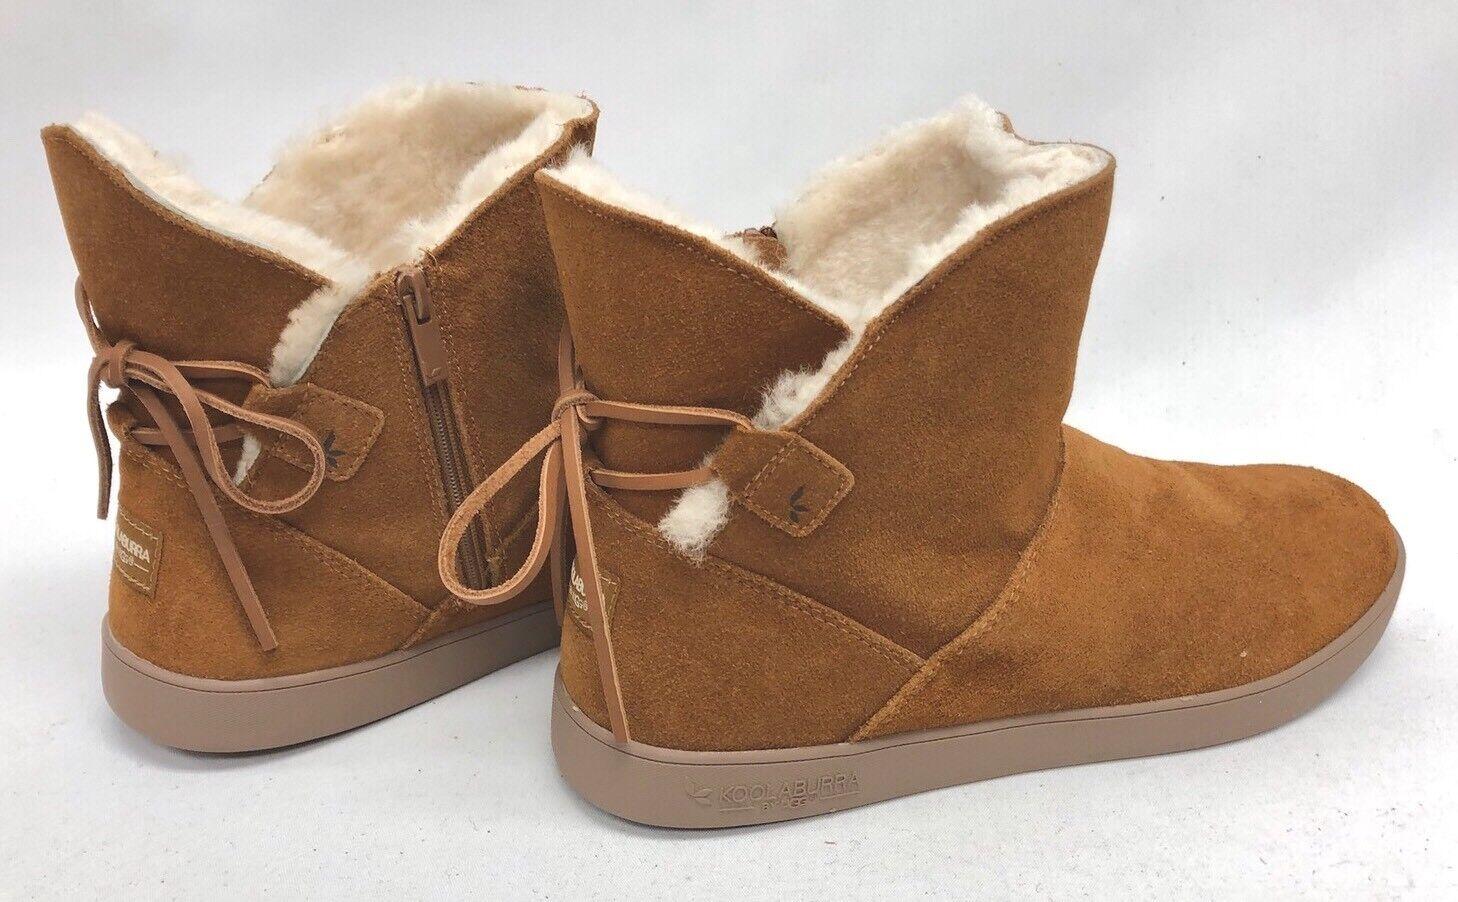 56668d9d botas shazi Mini Castaño Gamuza de Piel de Oveja 109362 para mujeres  Zapatos Arco KOOLABURRA DE nnelst6892-Botas